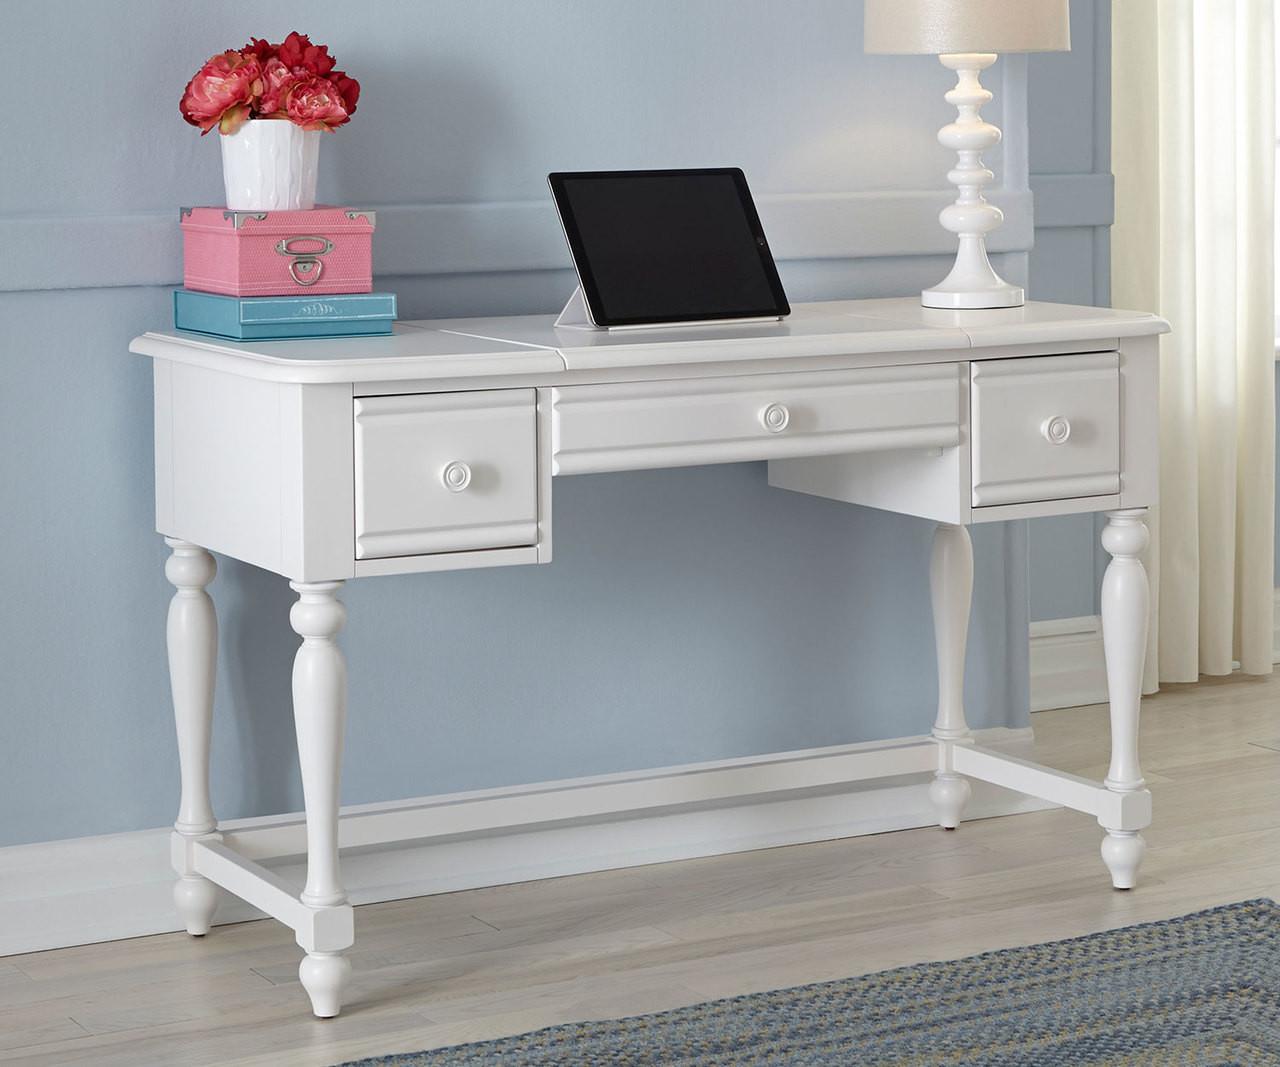 half off 13c7b d0bfc Summer House Vanity Desk White